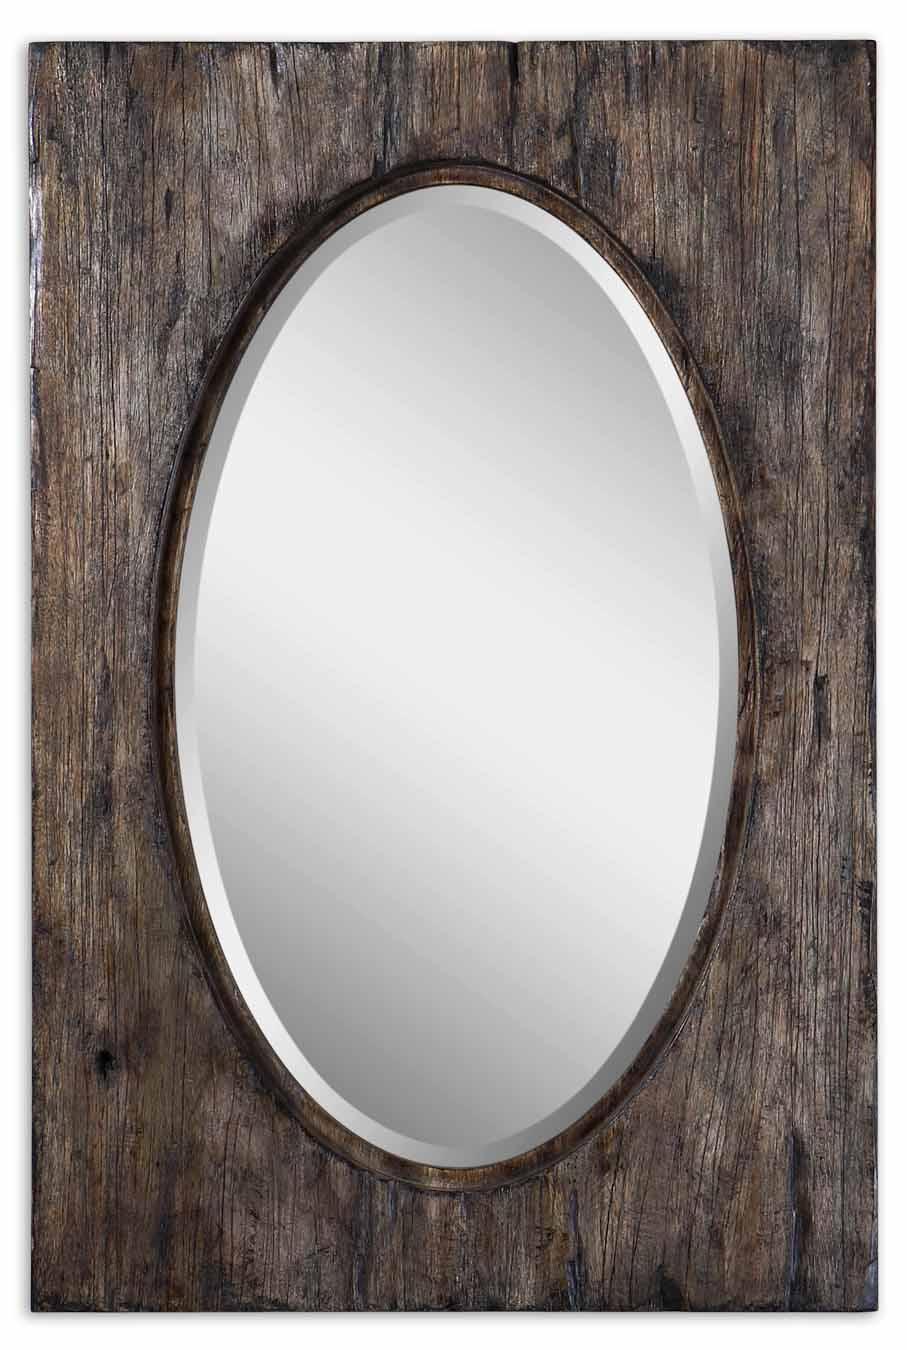 Uttermost Mirrors Hichcock Mirror - Item Number: 09503